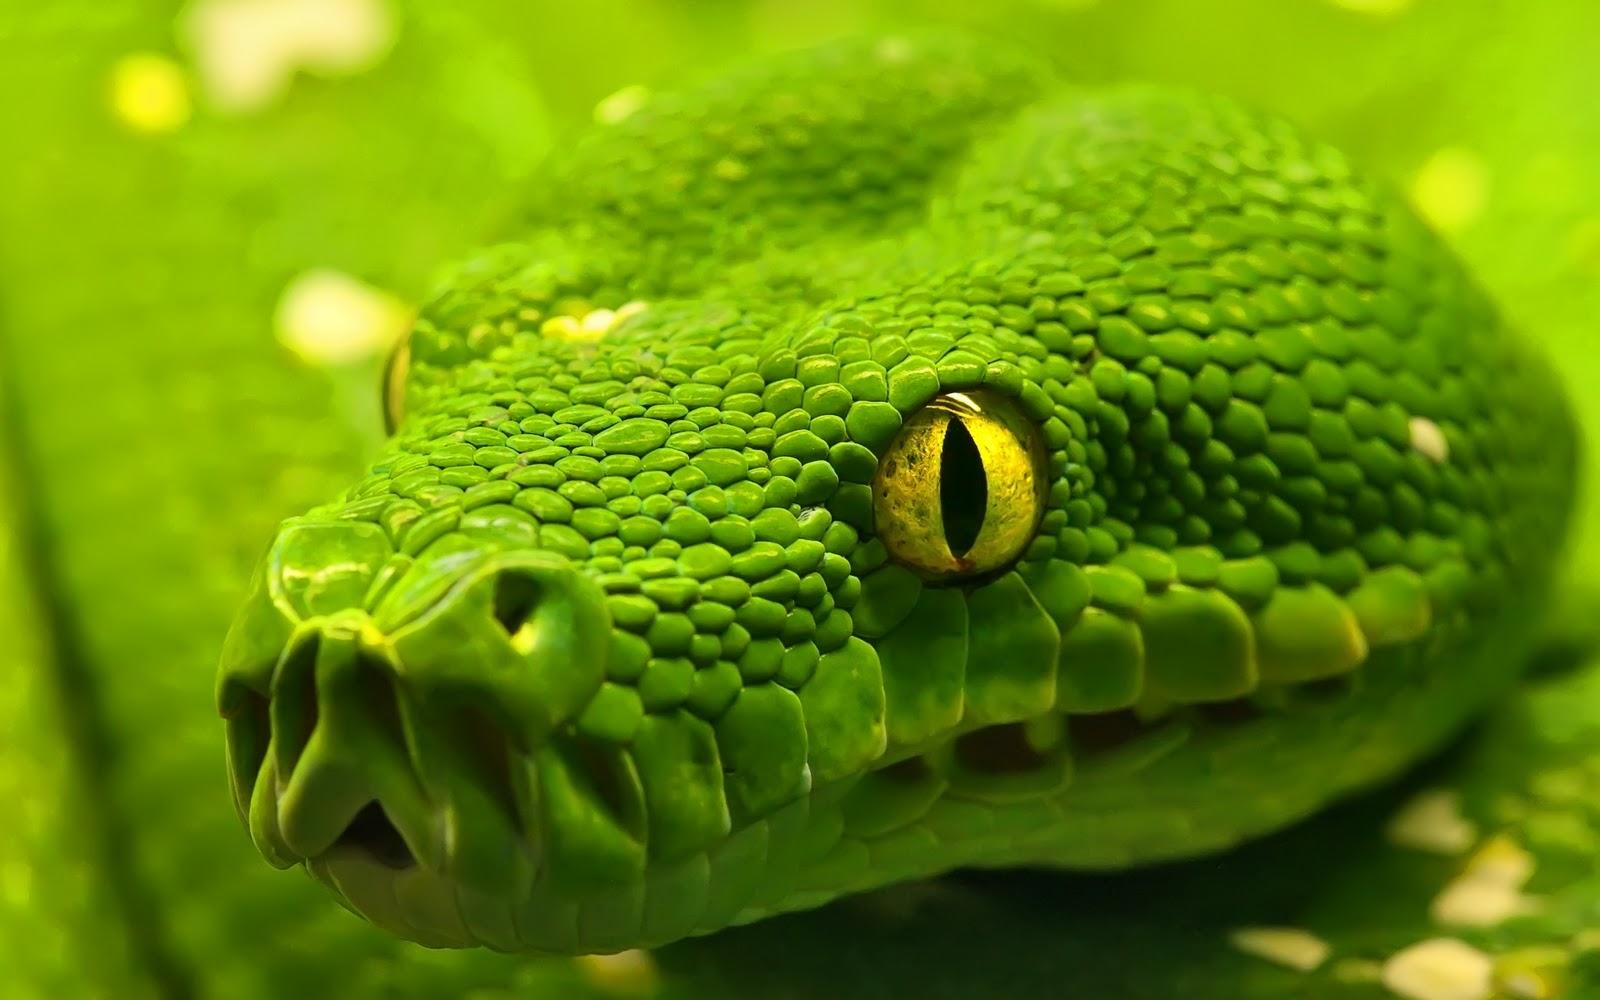 http://2.bp.blogspot.com/_H8M1zby0QoU/TPWw619X5rI/AAAAAAAAAD0/Ds4u5zdZxPw/s1600/green_anaconda-wide.jpg